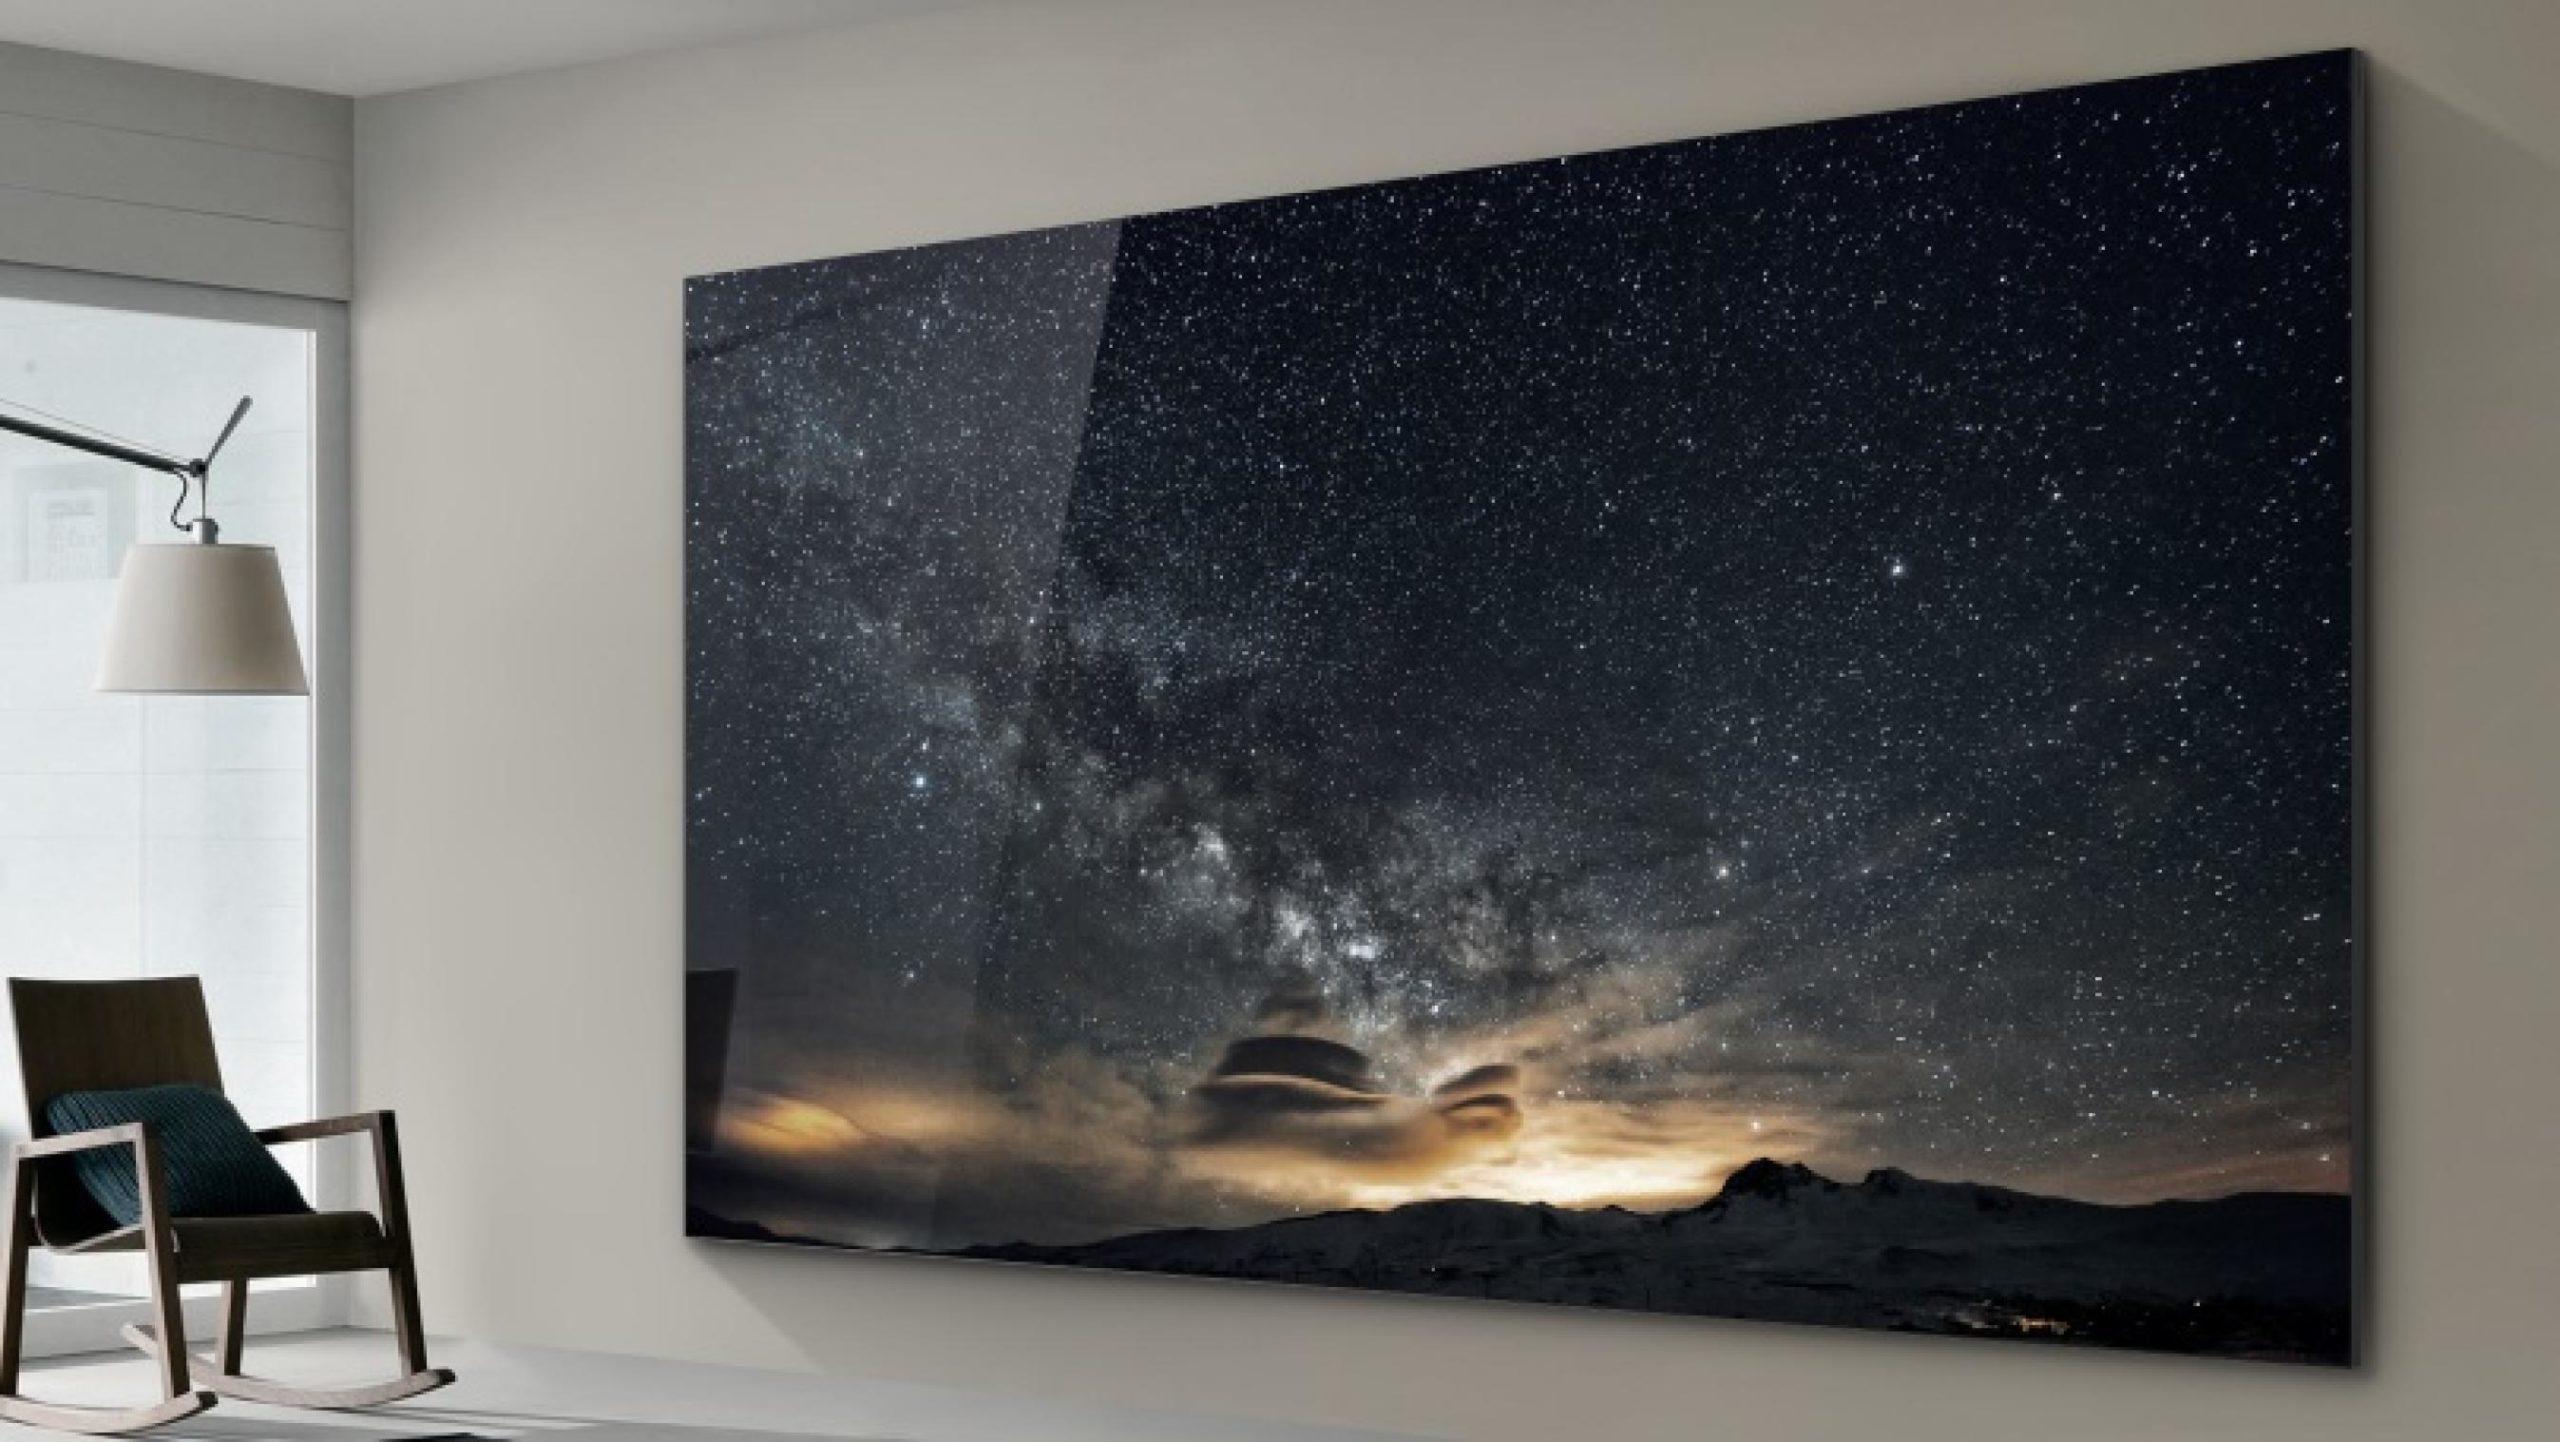 Внешний вид беспроводного телевизора Samsung